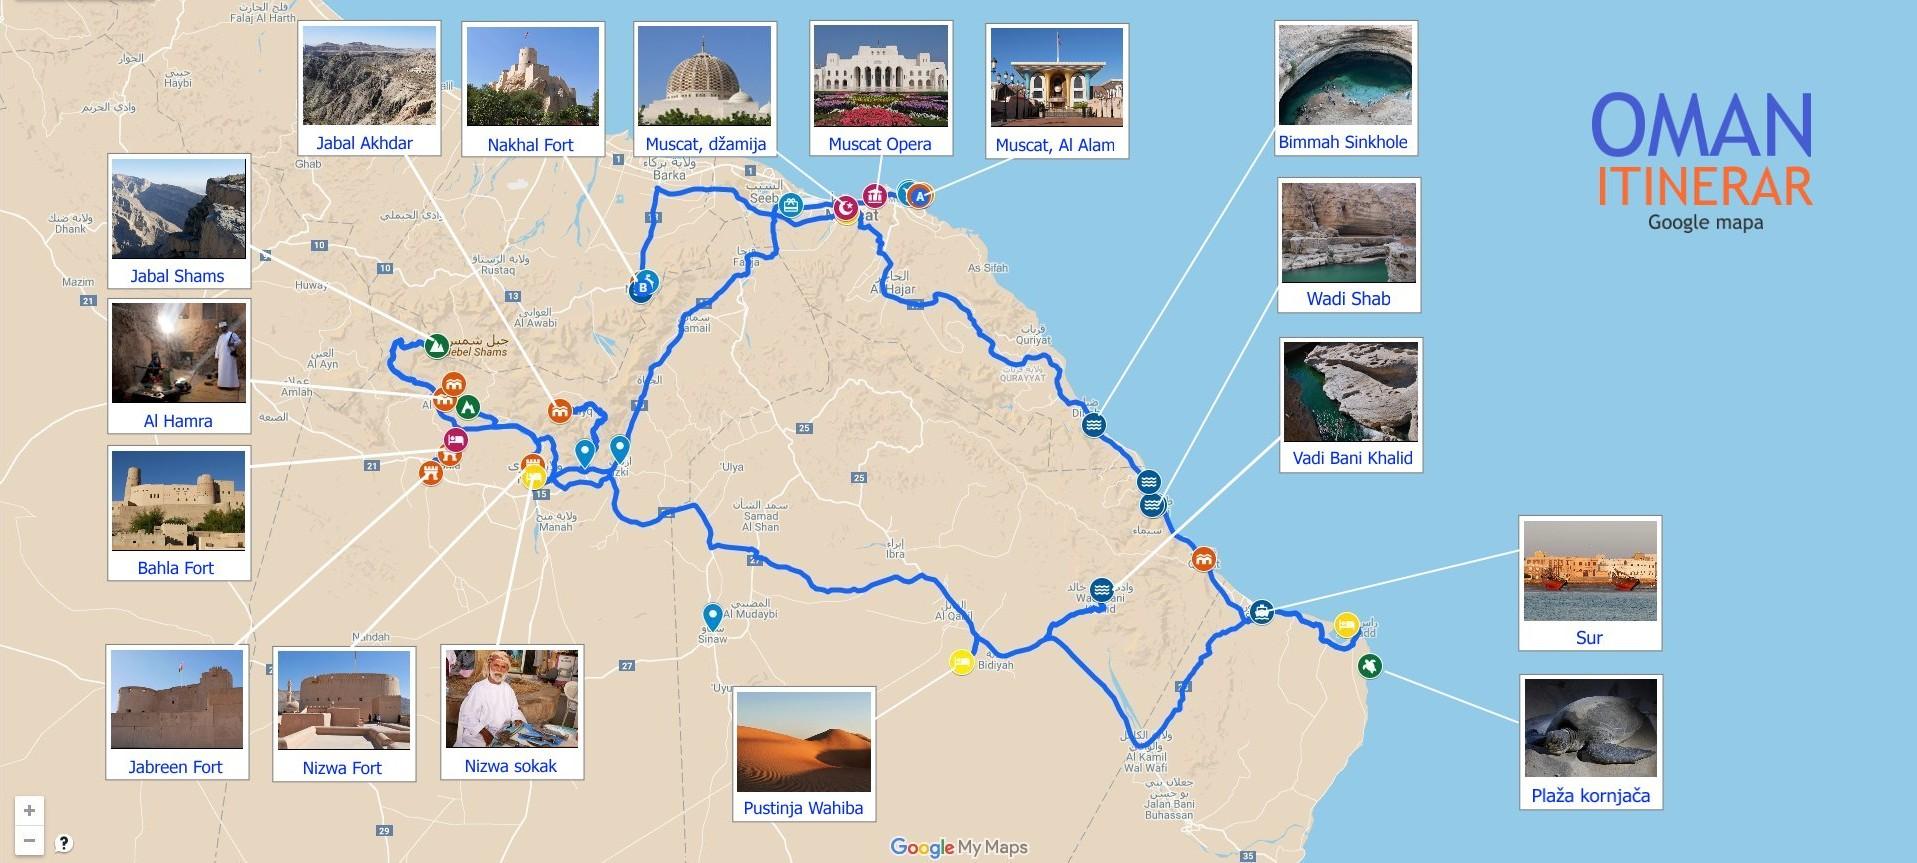 Oman Itinerar Google